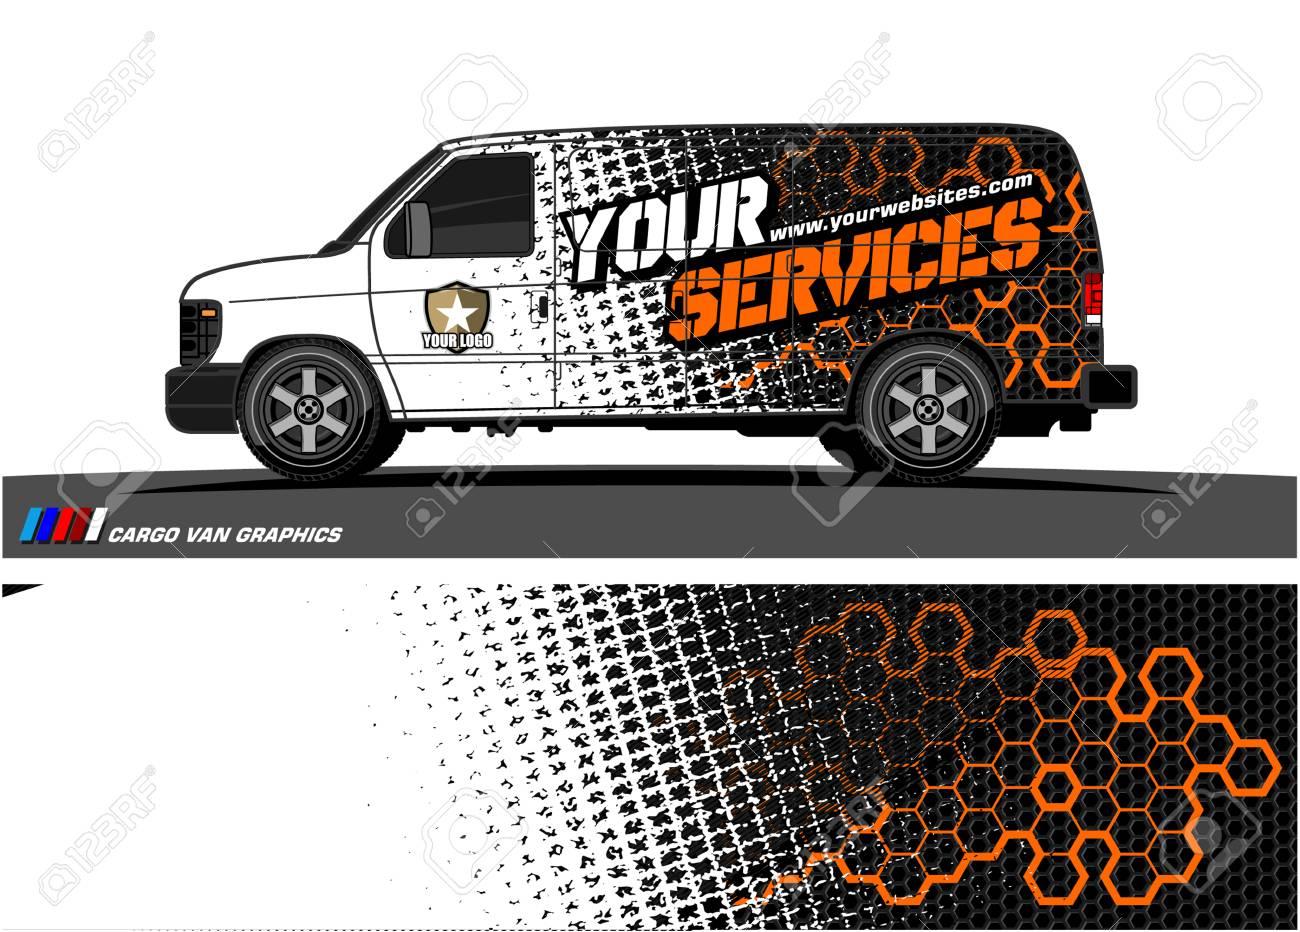 Cargo van graphic vector. abstract grunge background design for vehicle vinyl wrap - 100510454